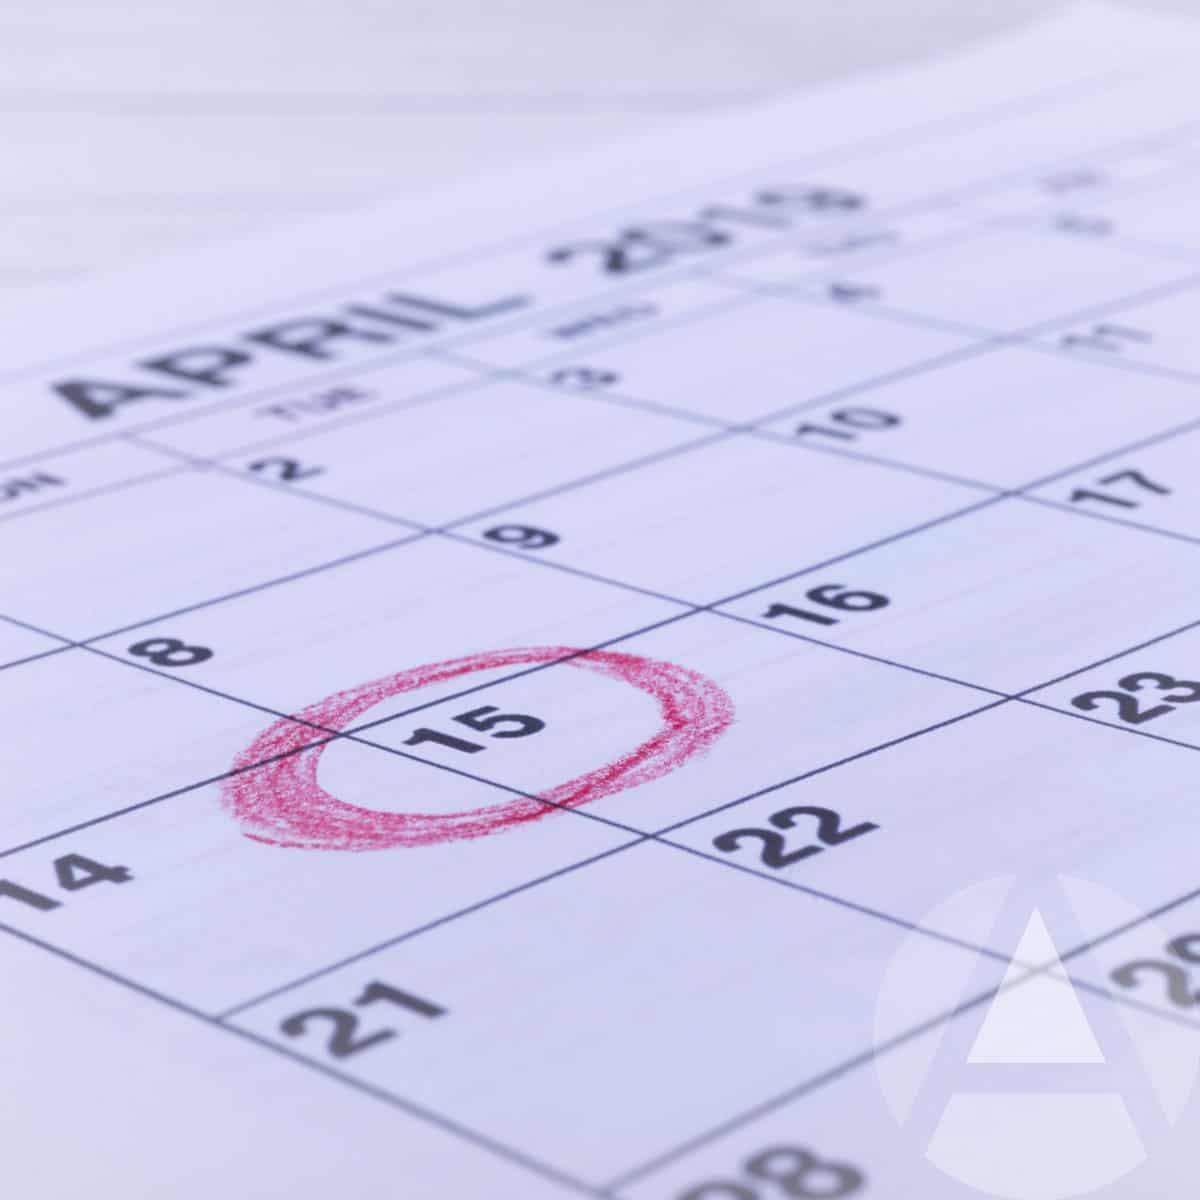 Tax day circled on the desk calendar